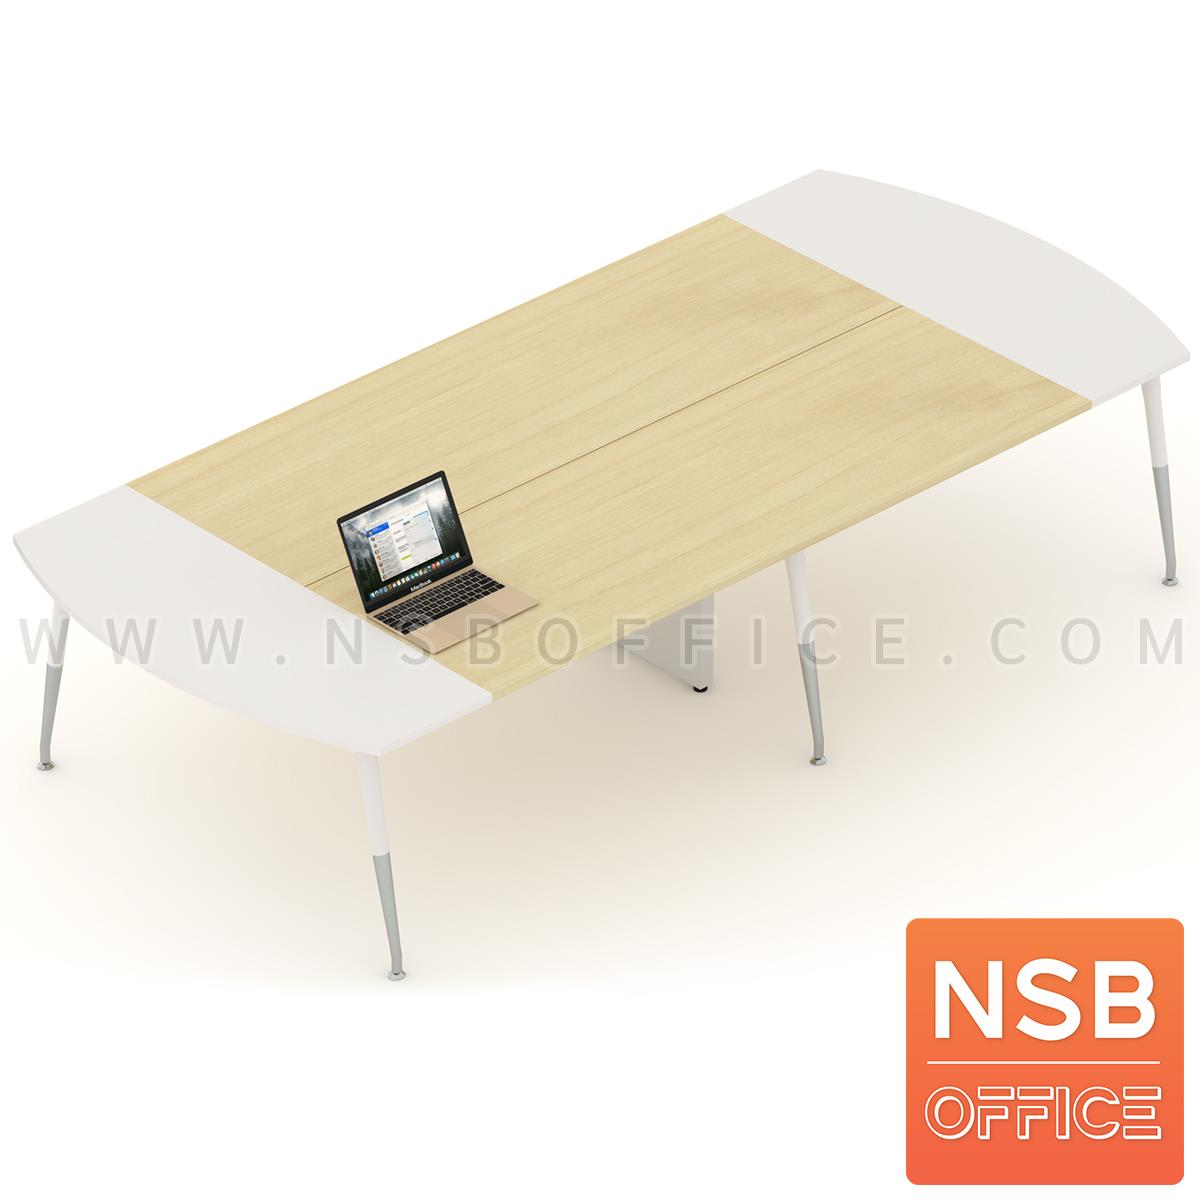 A05A168:โต๊ะประชุมหัวโค้ง ขาปลายเรียว ลึก 150 cm.  ขากลางมีกล่องนำสายไฟ